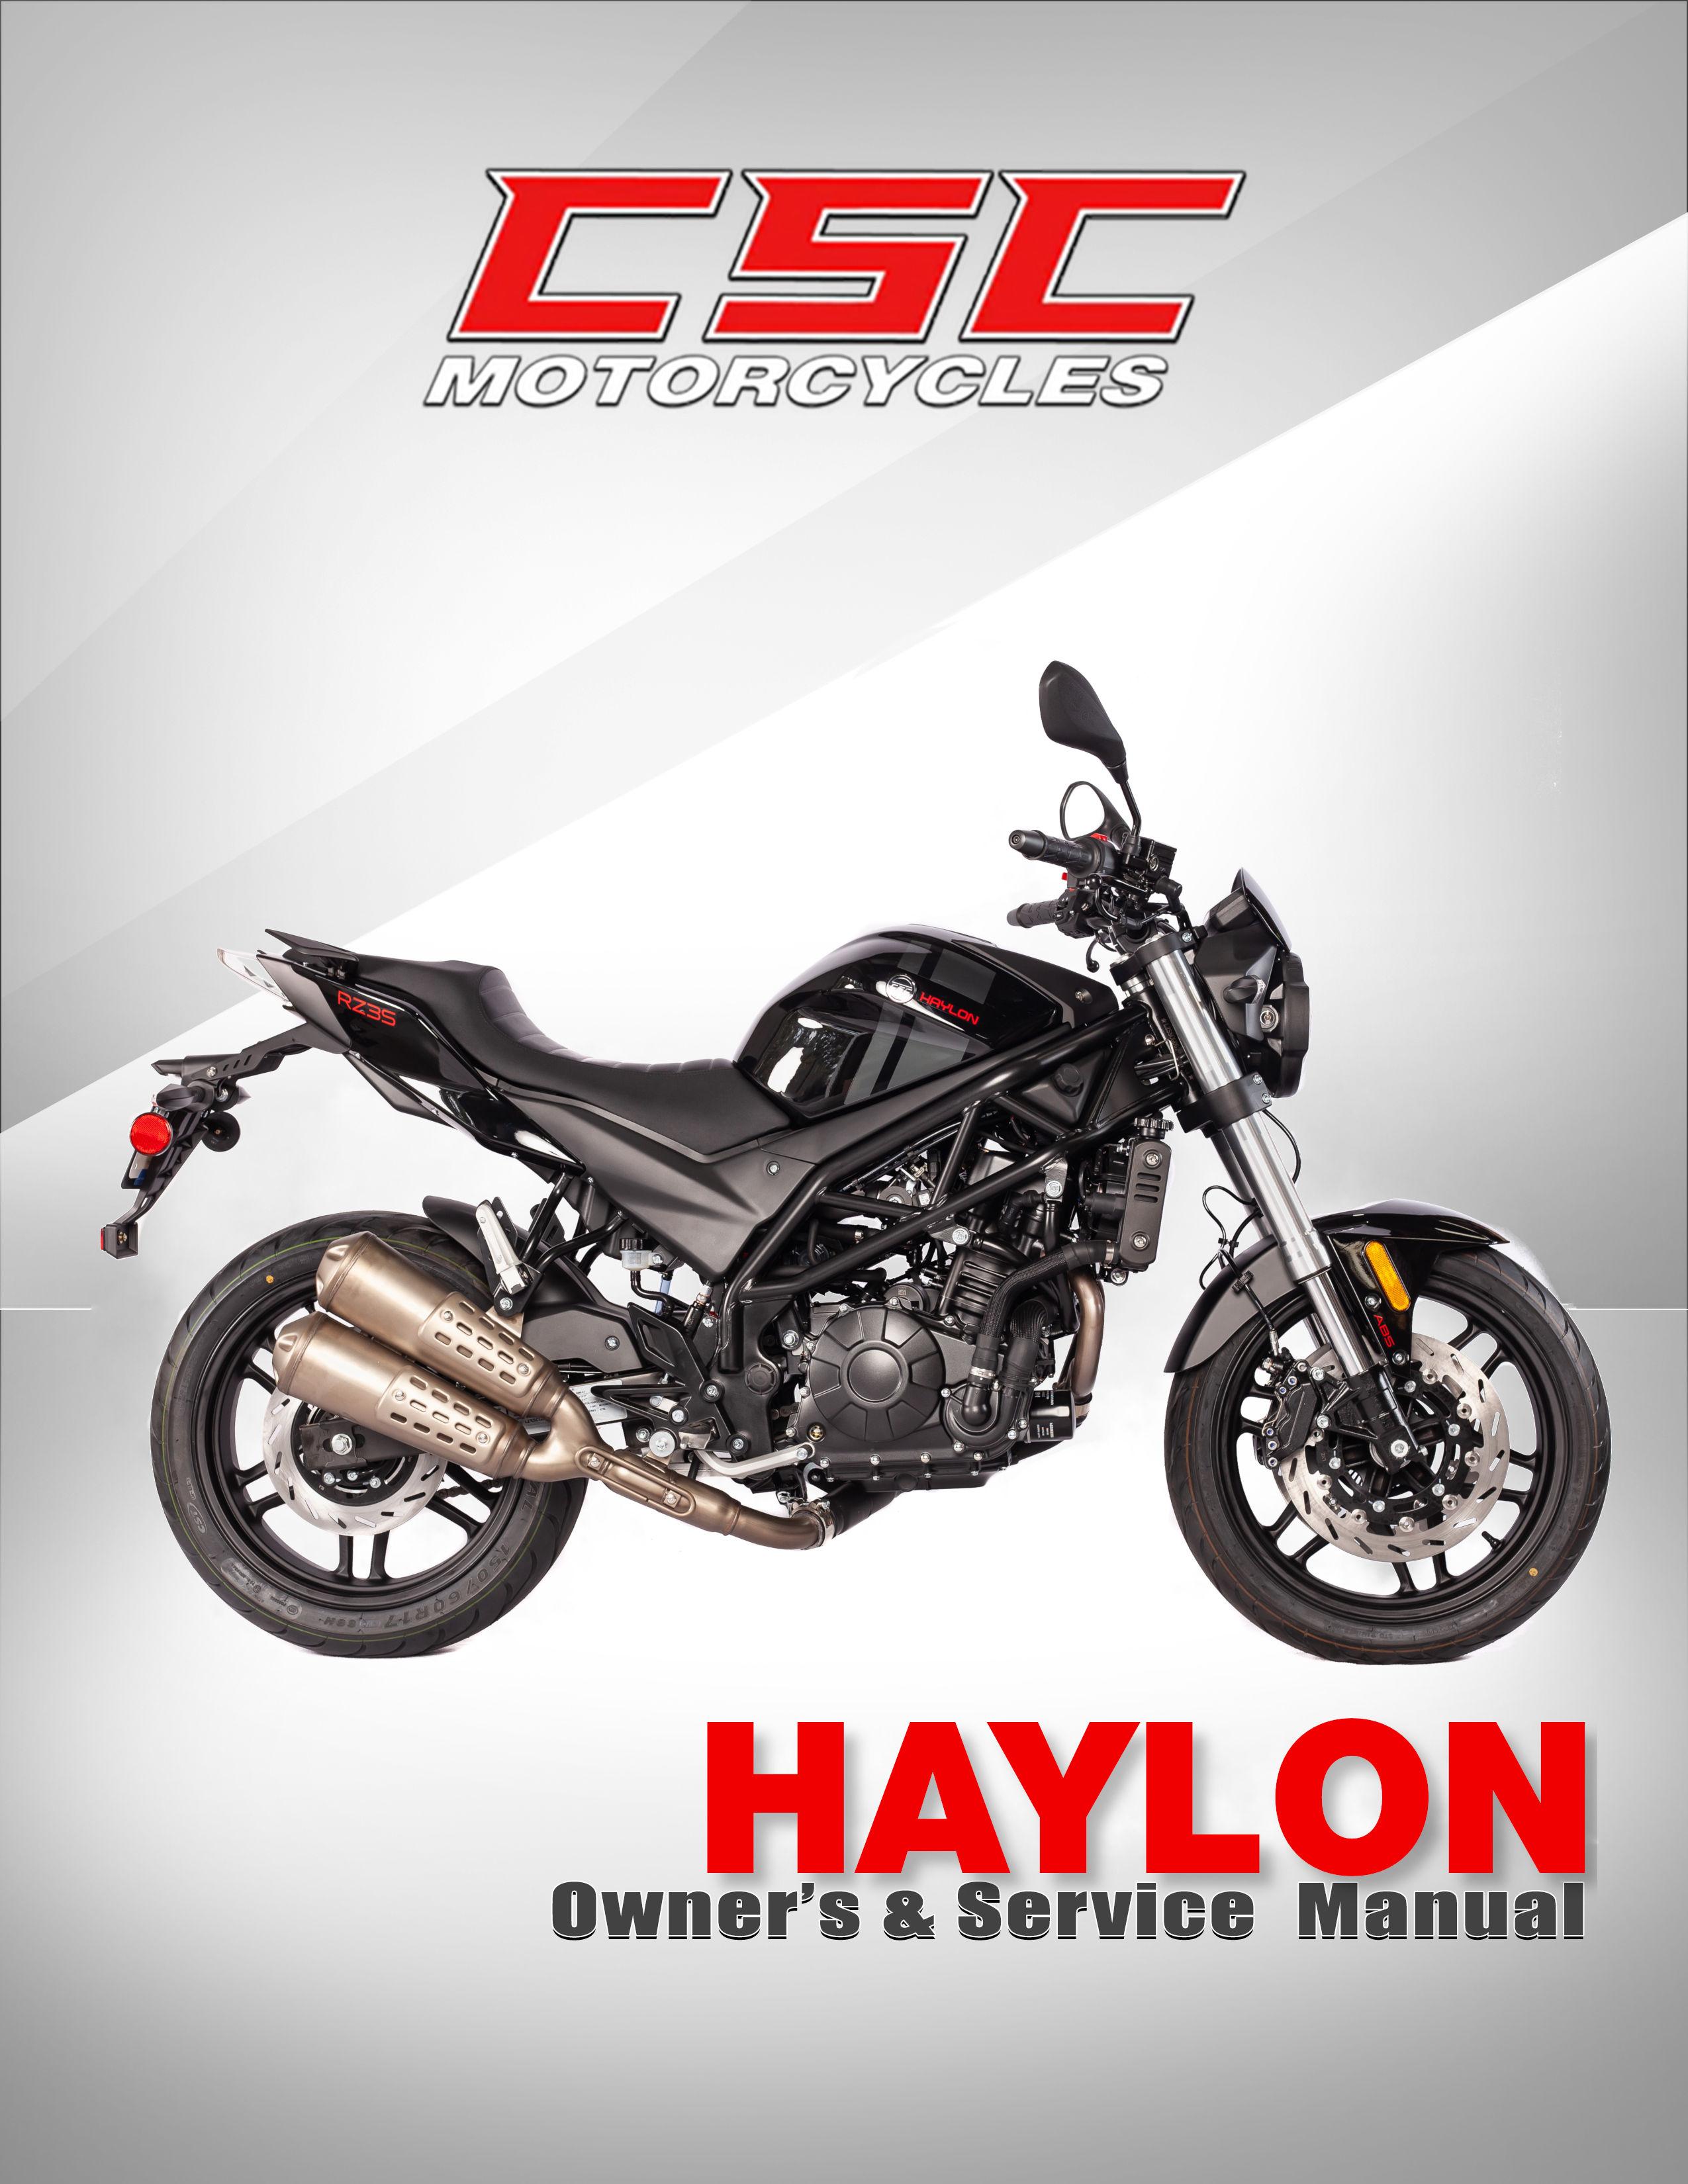 Haylon_Manual_Cover.JPG